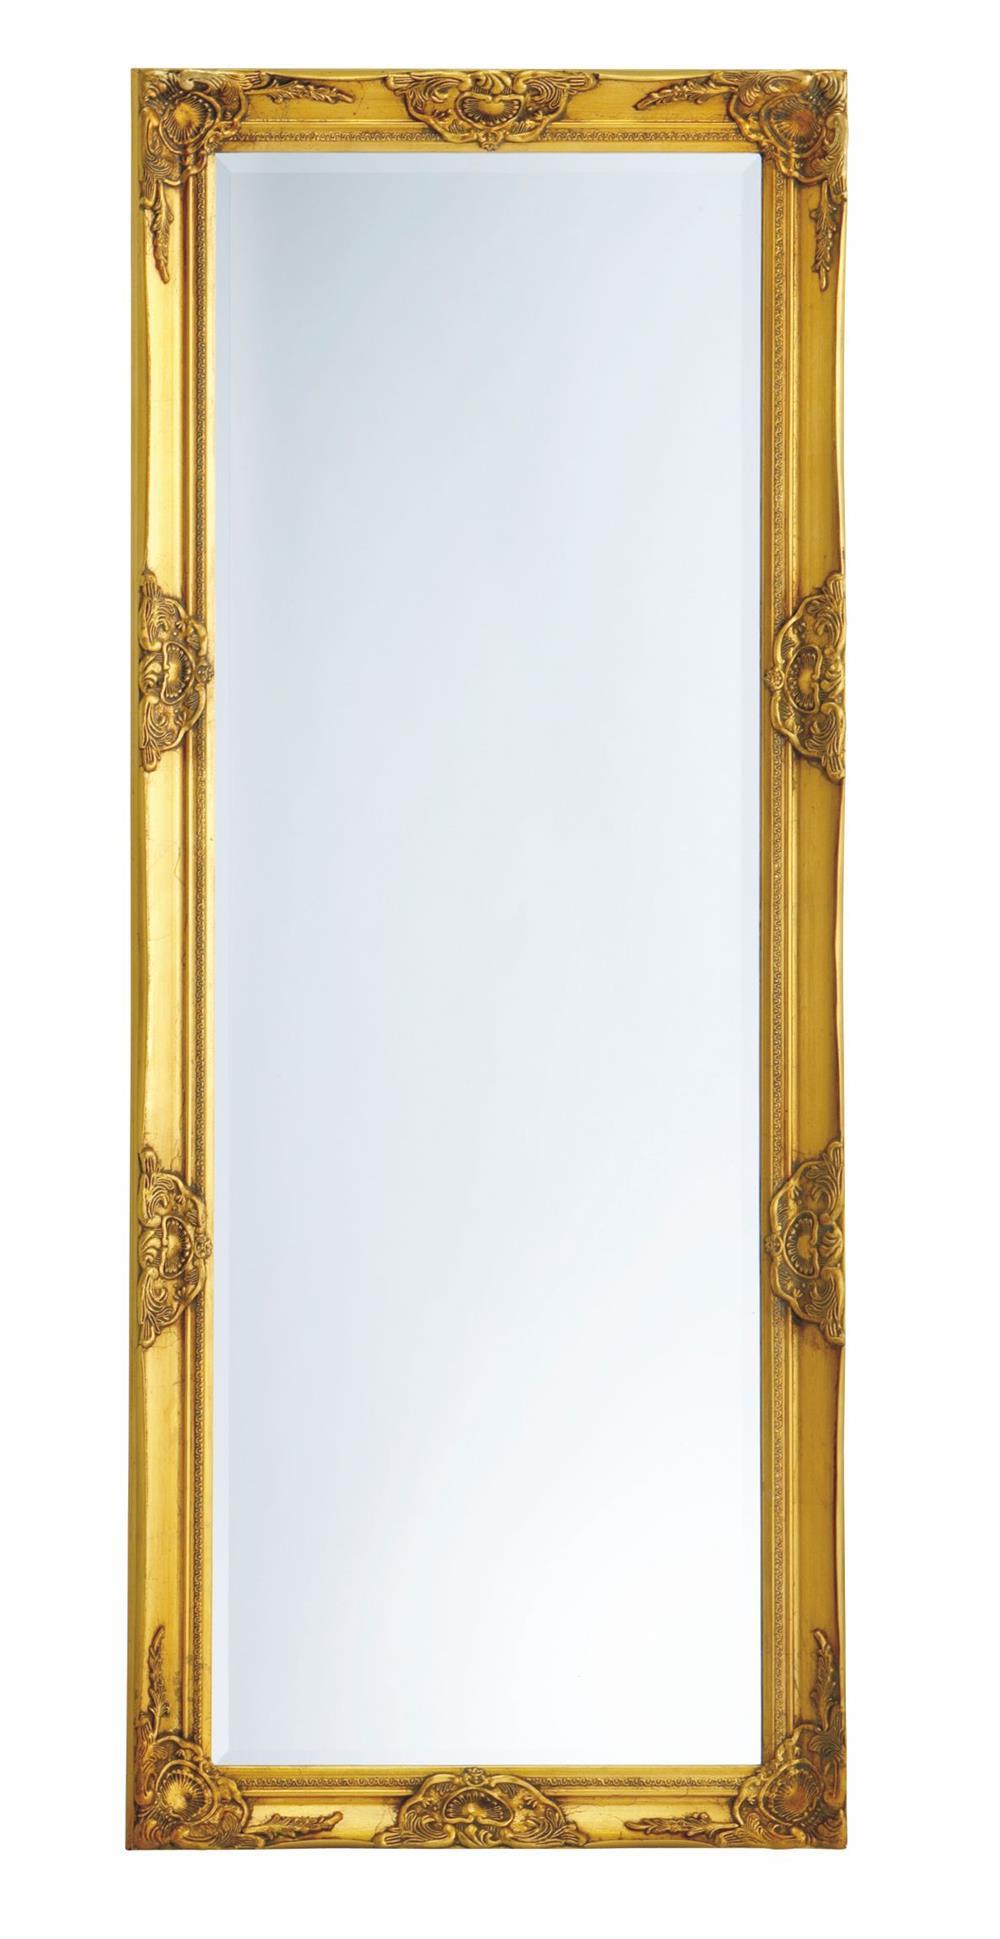 guld spejl Facetslebet Guld spejl 60x150cm   se mange Guld spejle guld spejl